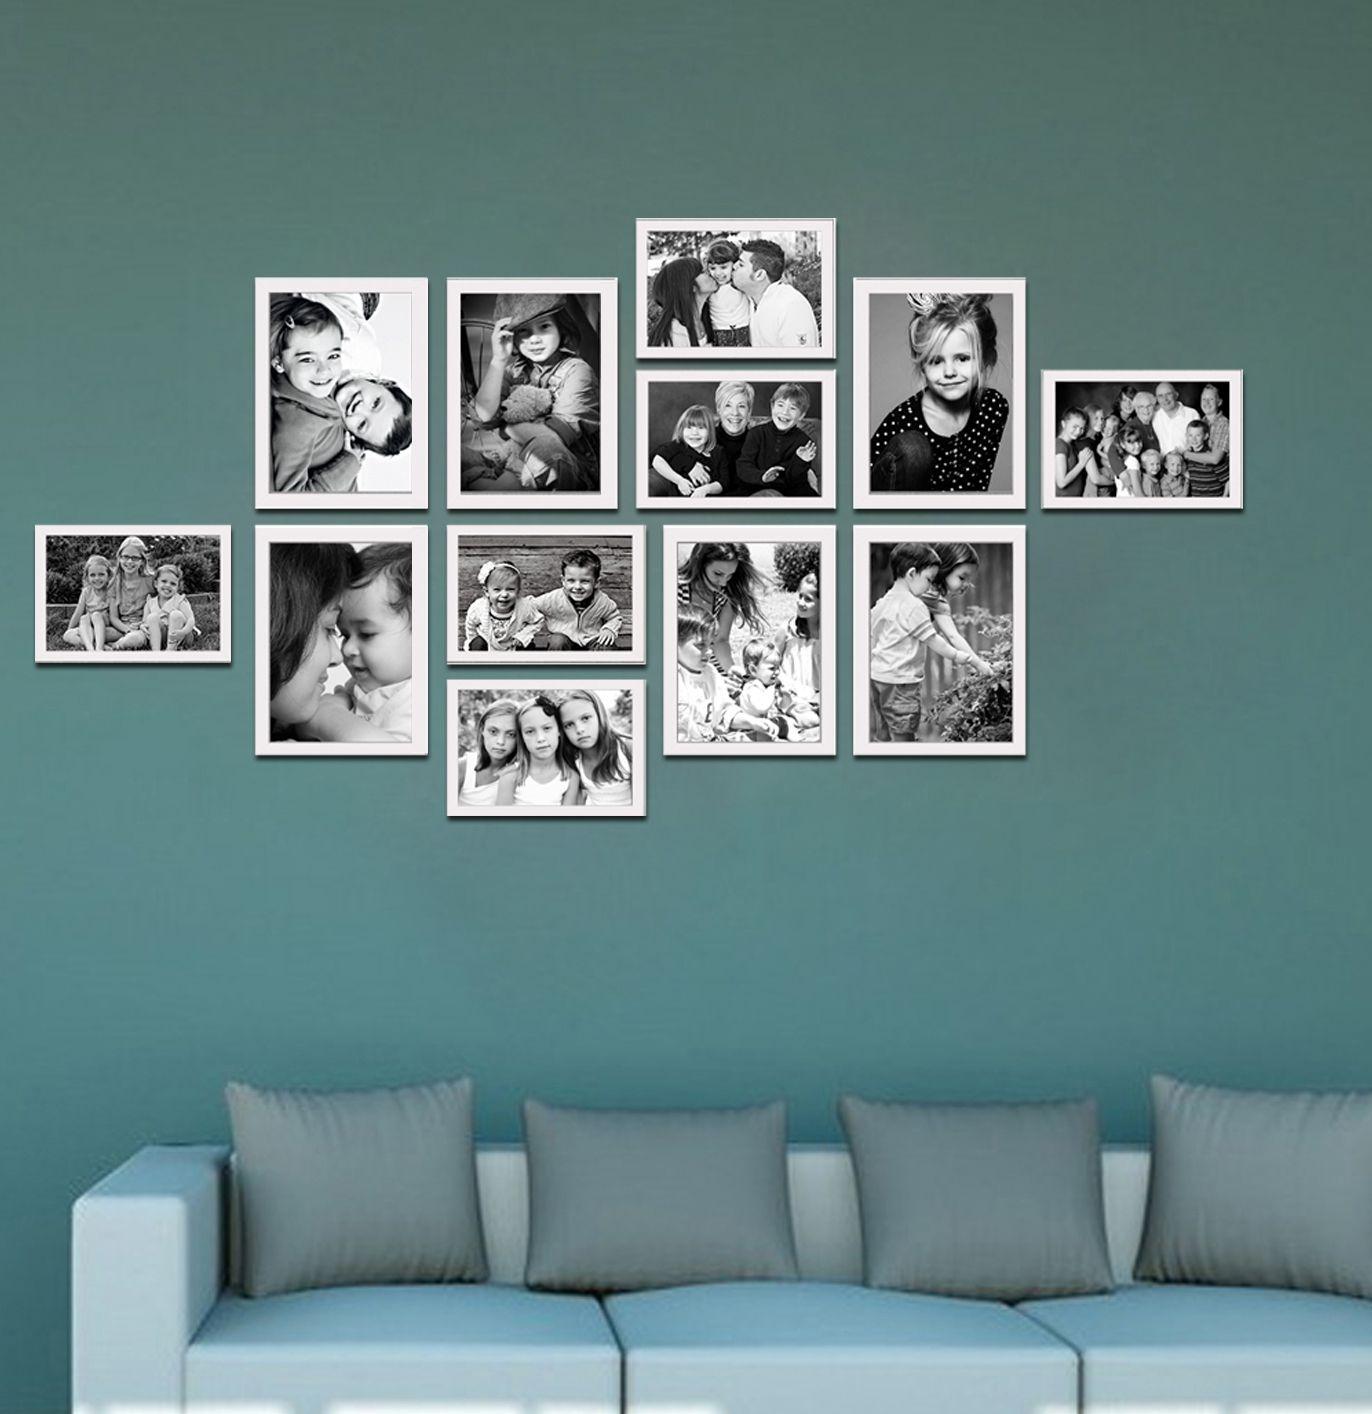 Elegant Arts & Frames Wood White Collage Photo Frame - Pack of 1